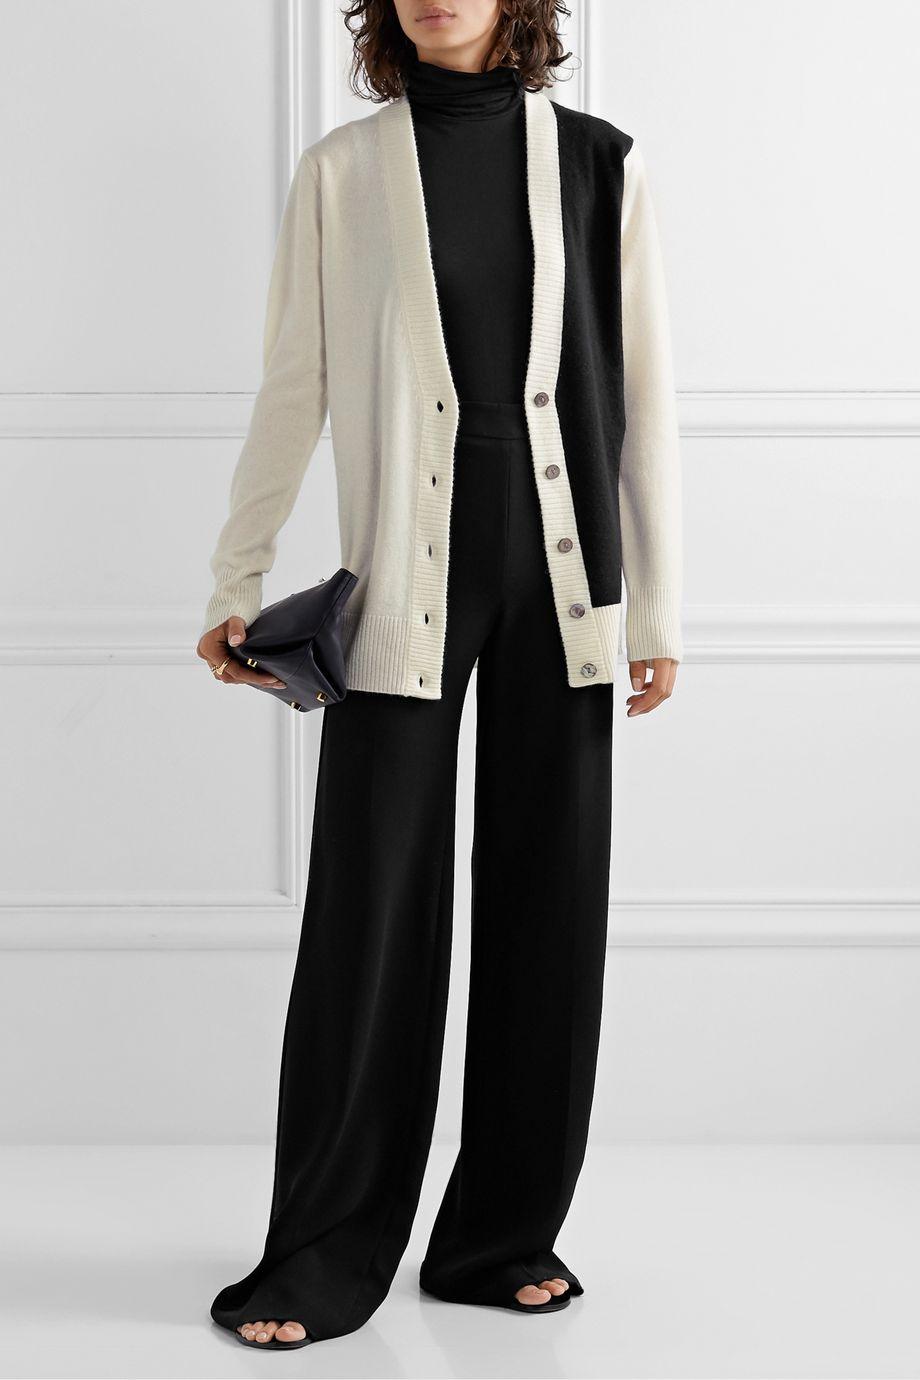 Madeleine Thompson Typhon two-tone cashmere cardigan